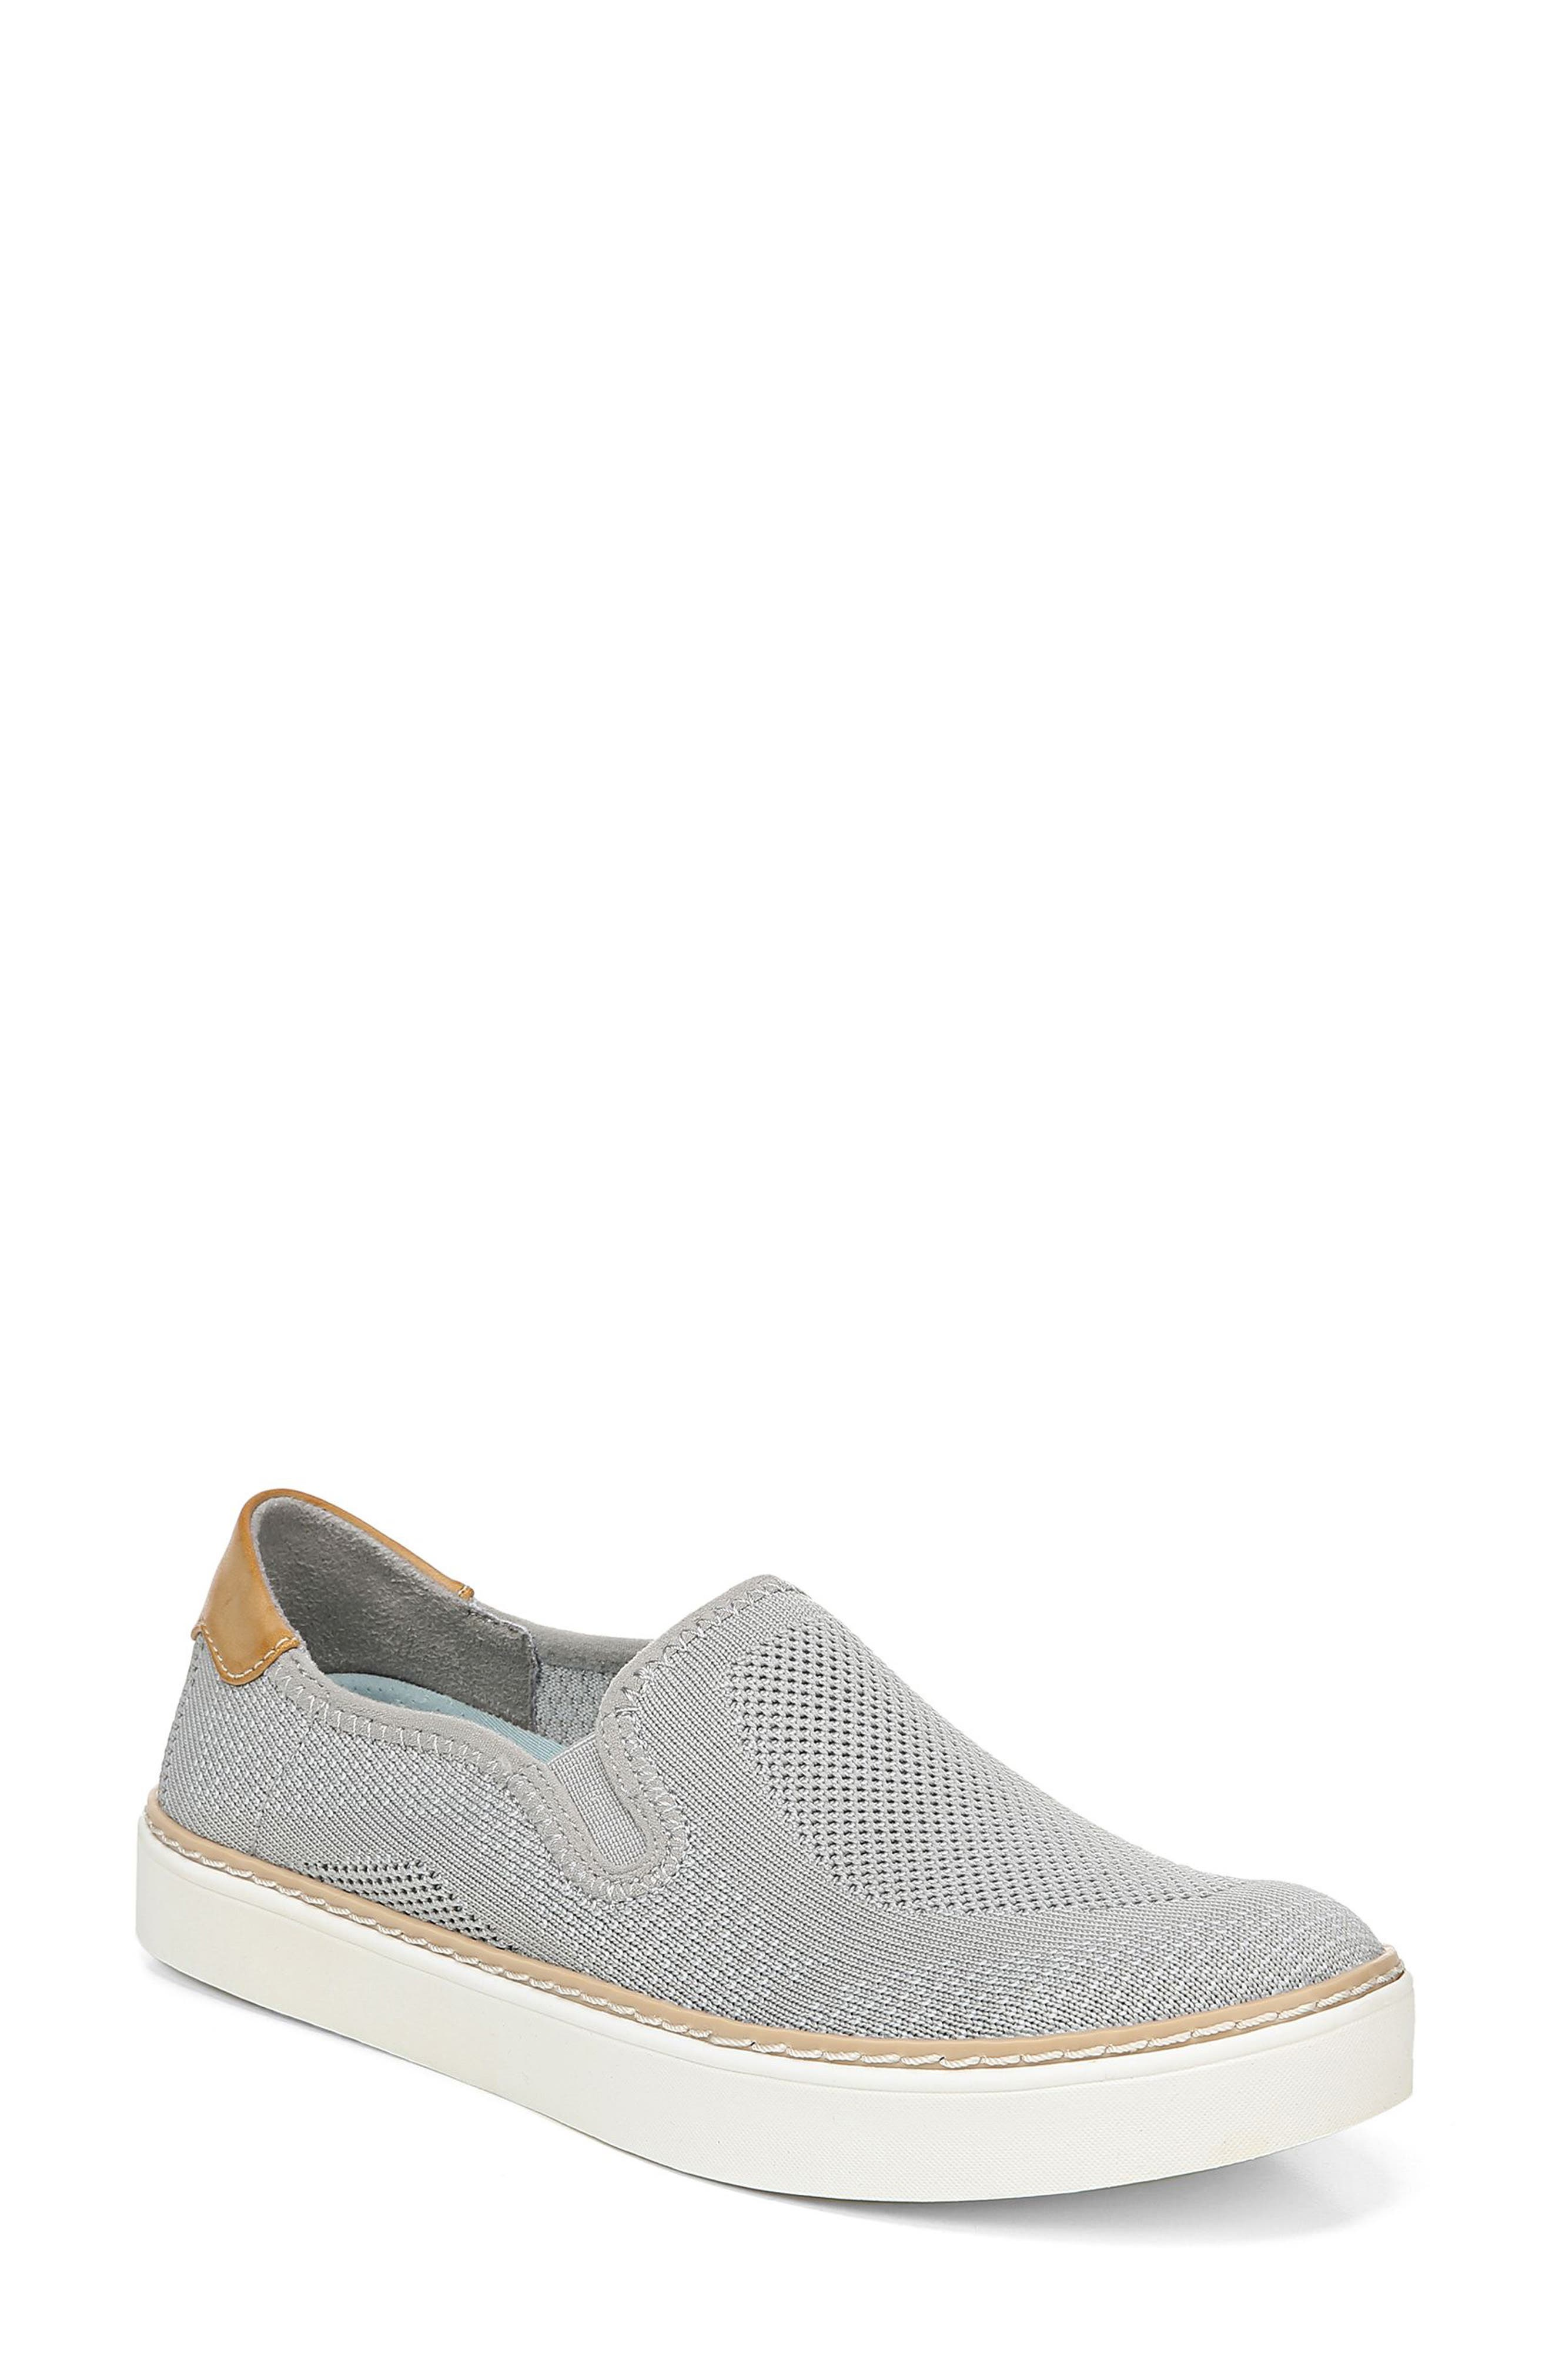 ,                             Madi Slip-On Sneaker,                             Main thumbnail 1, color,                             GREY KNIT FABRIC